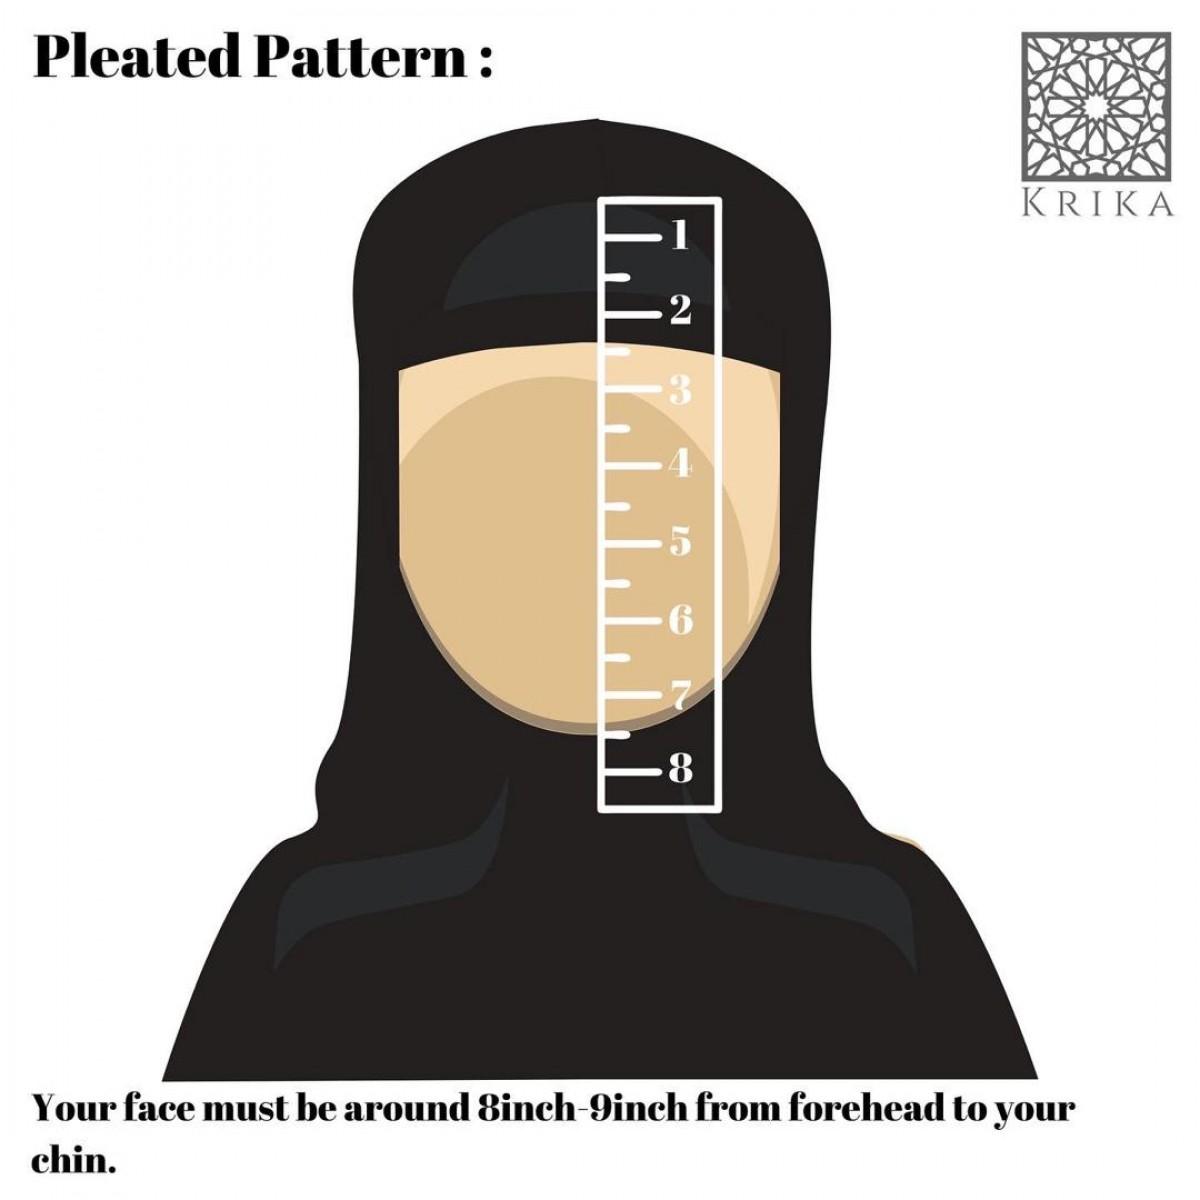 Krika Hasna Solid Black Pleated Pattern